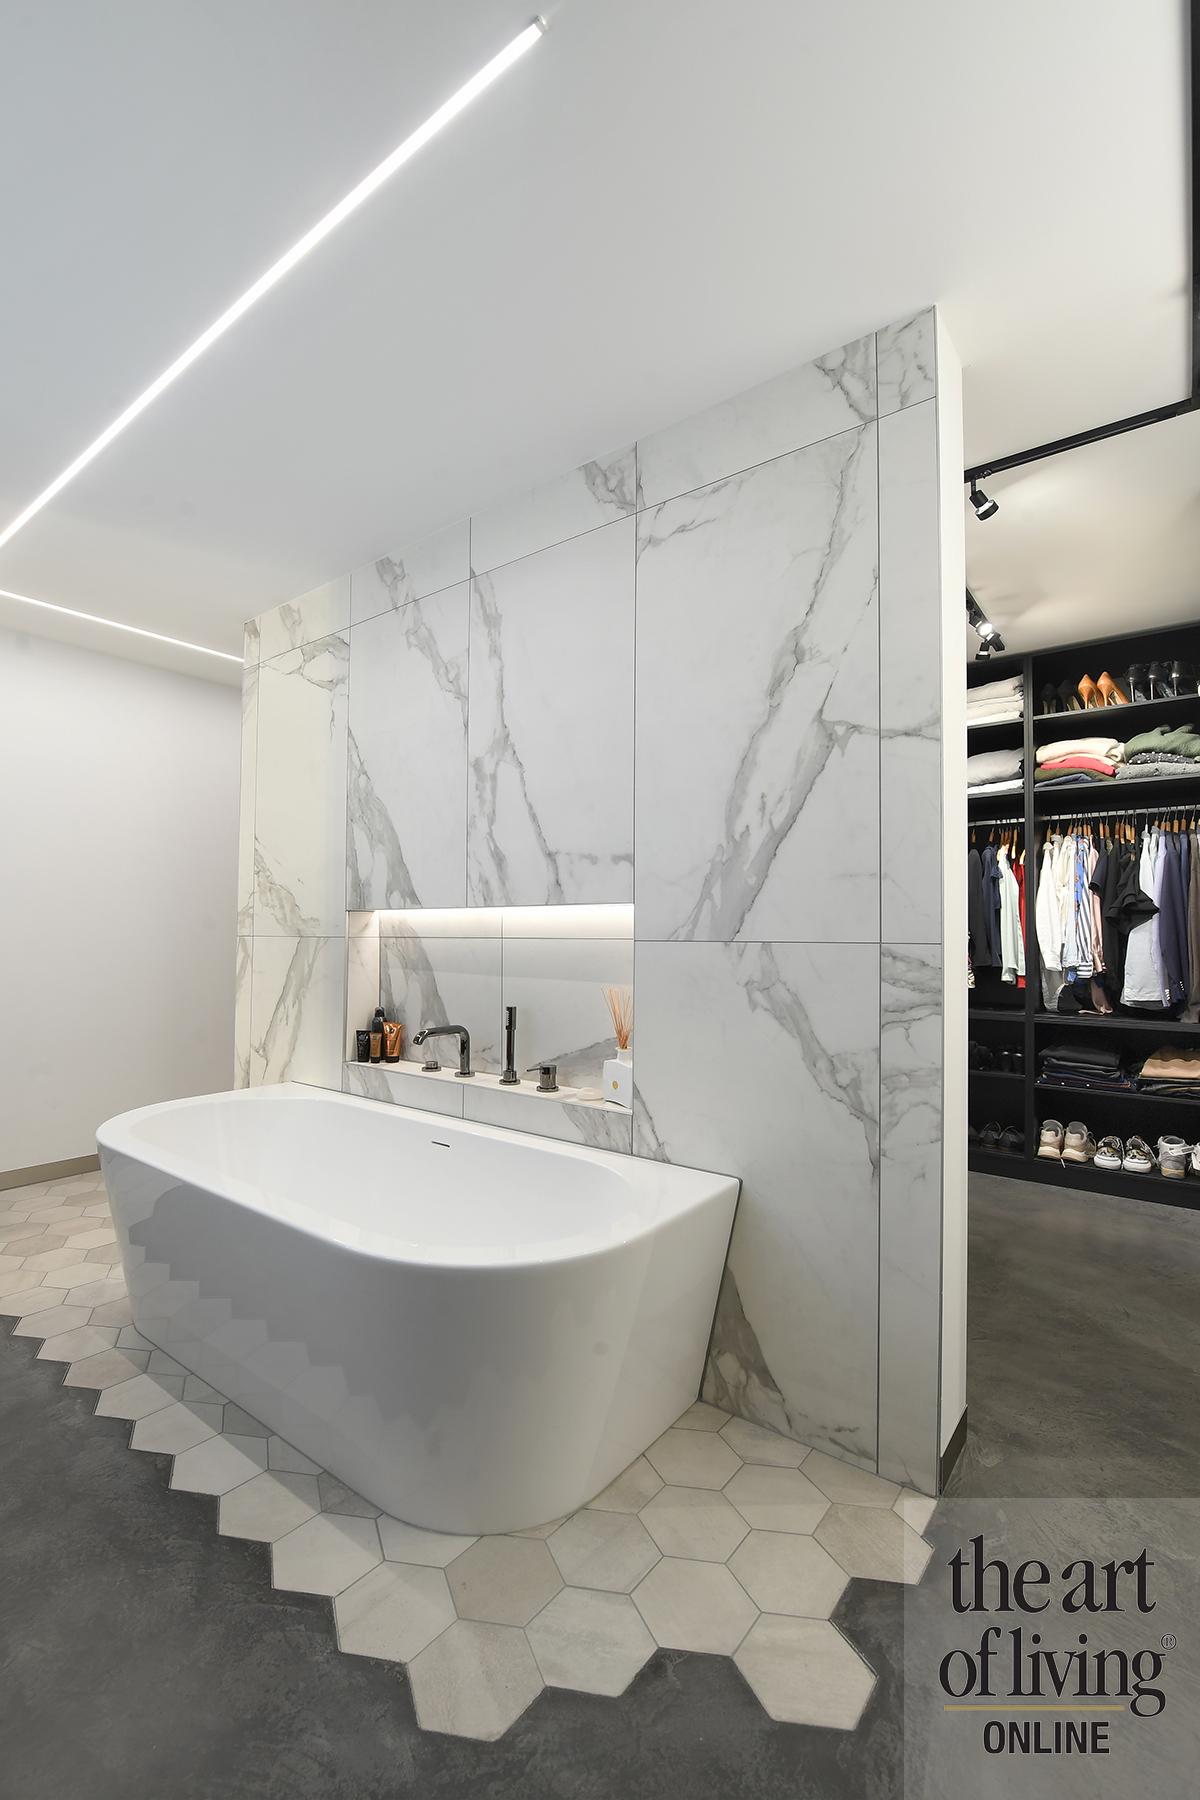 Moderne villa| Bruis Architectuur, the art of living